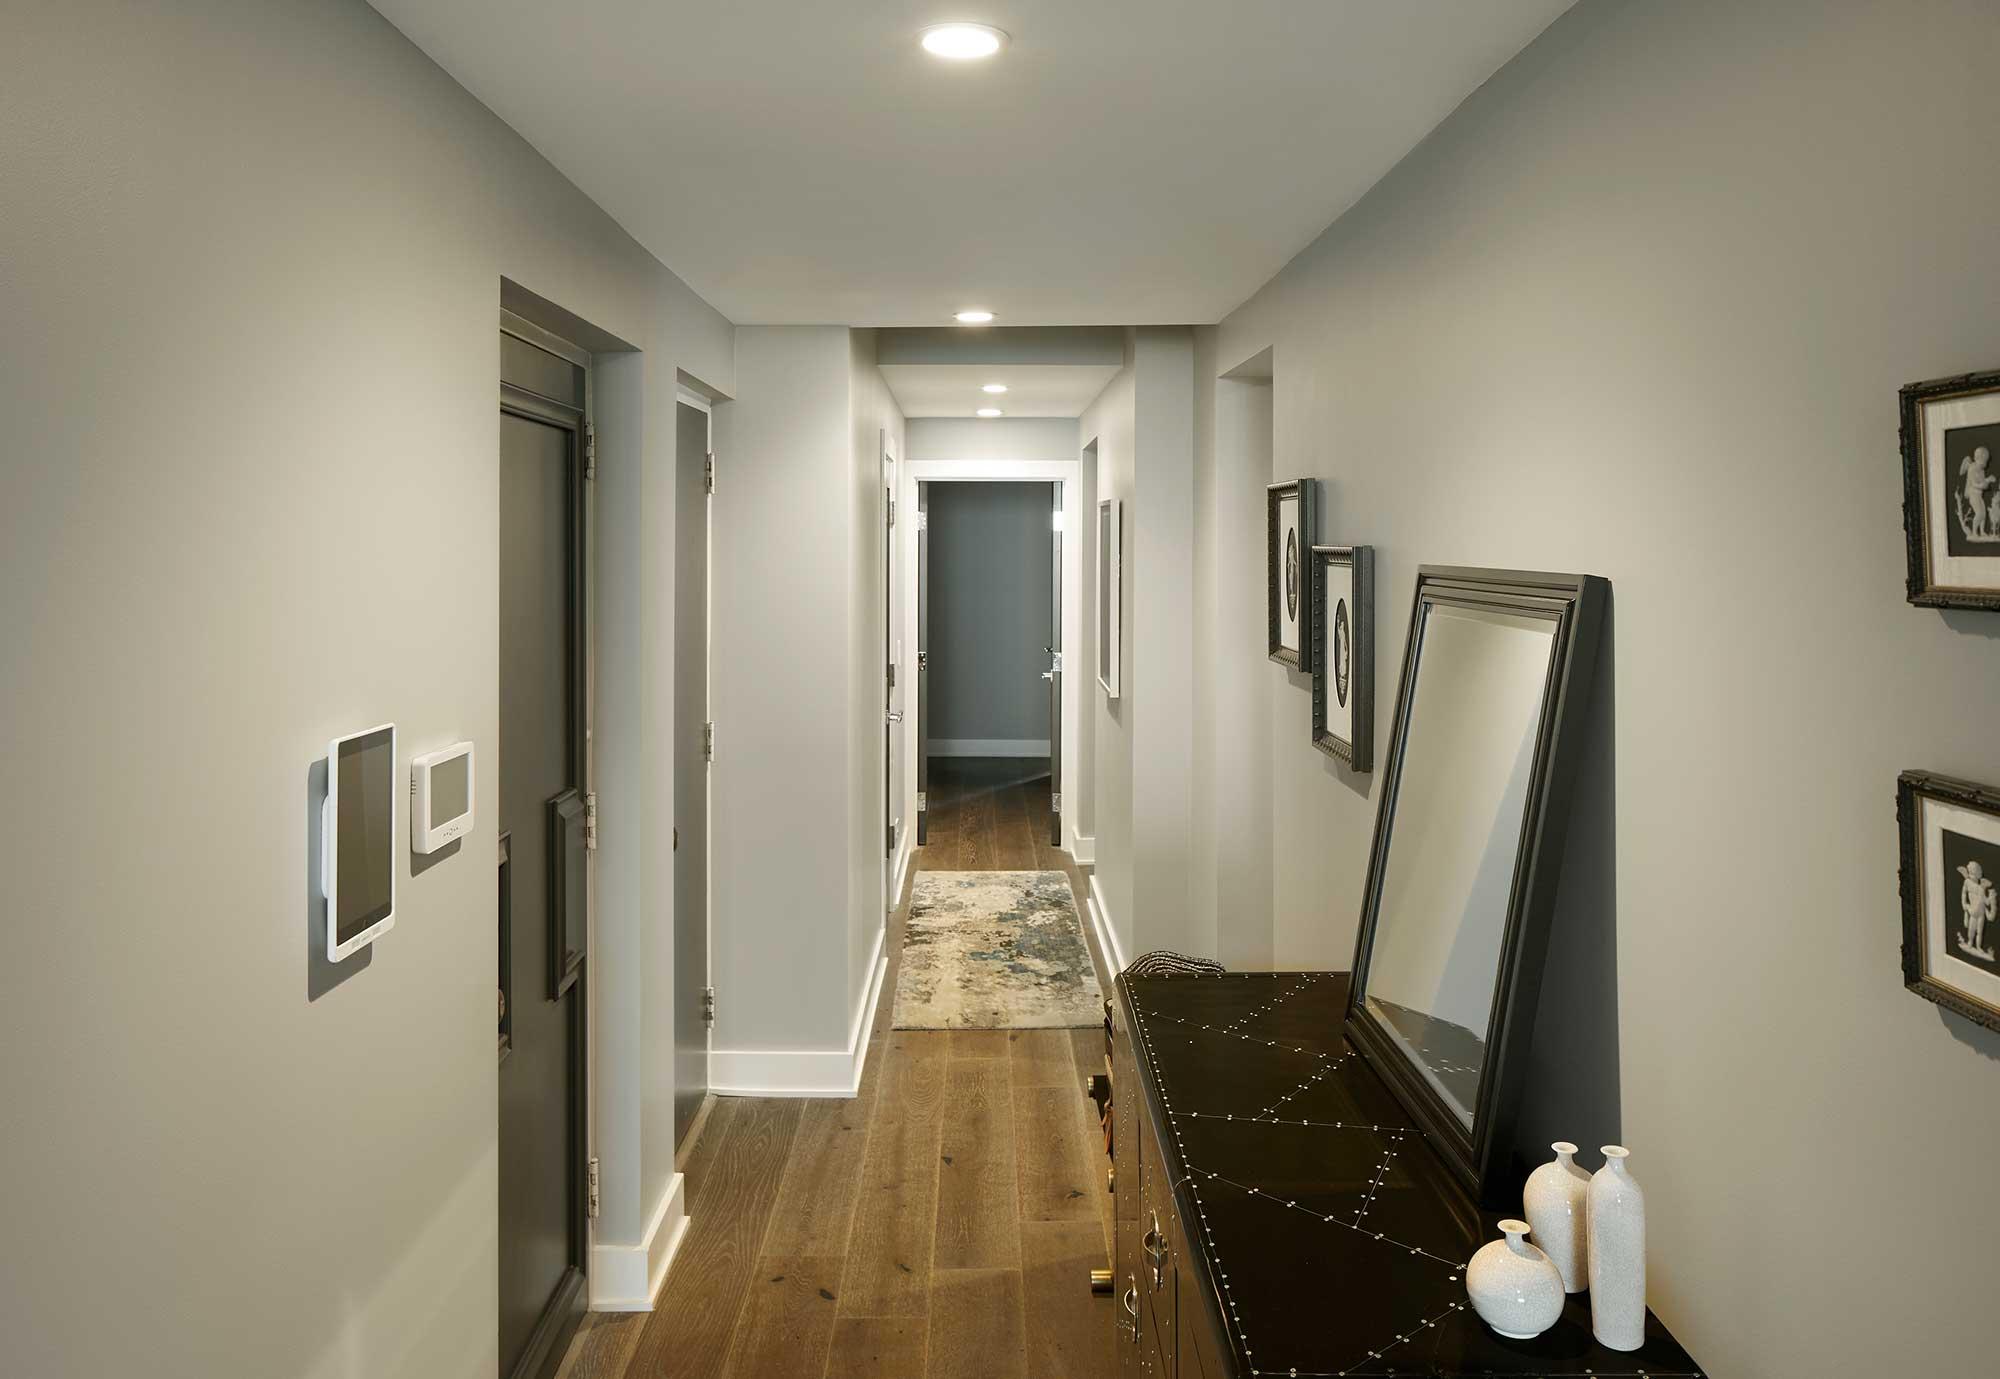 Installation Gallery Hallway Lighting